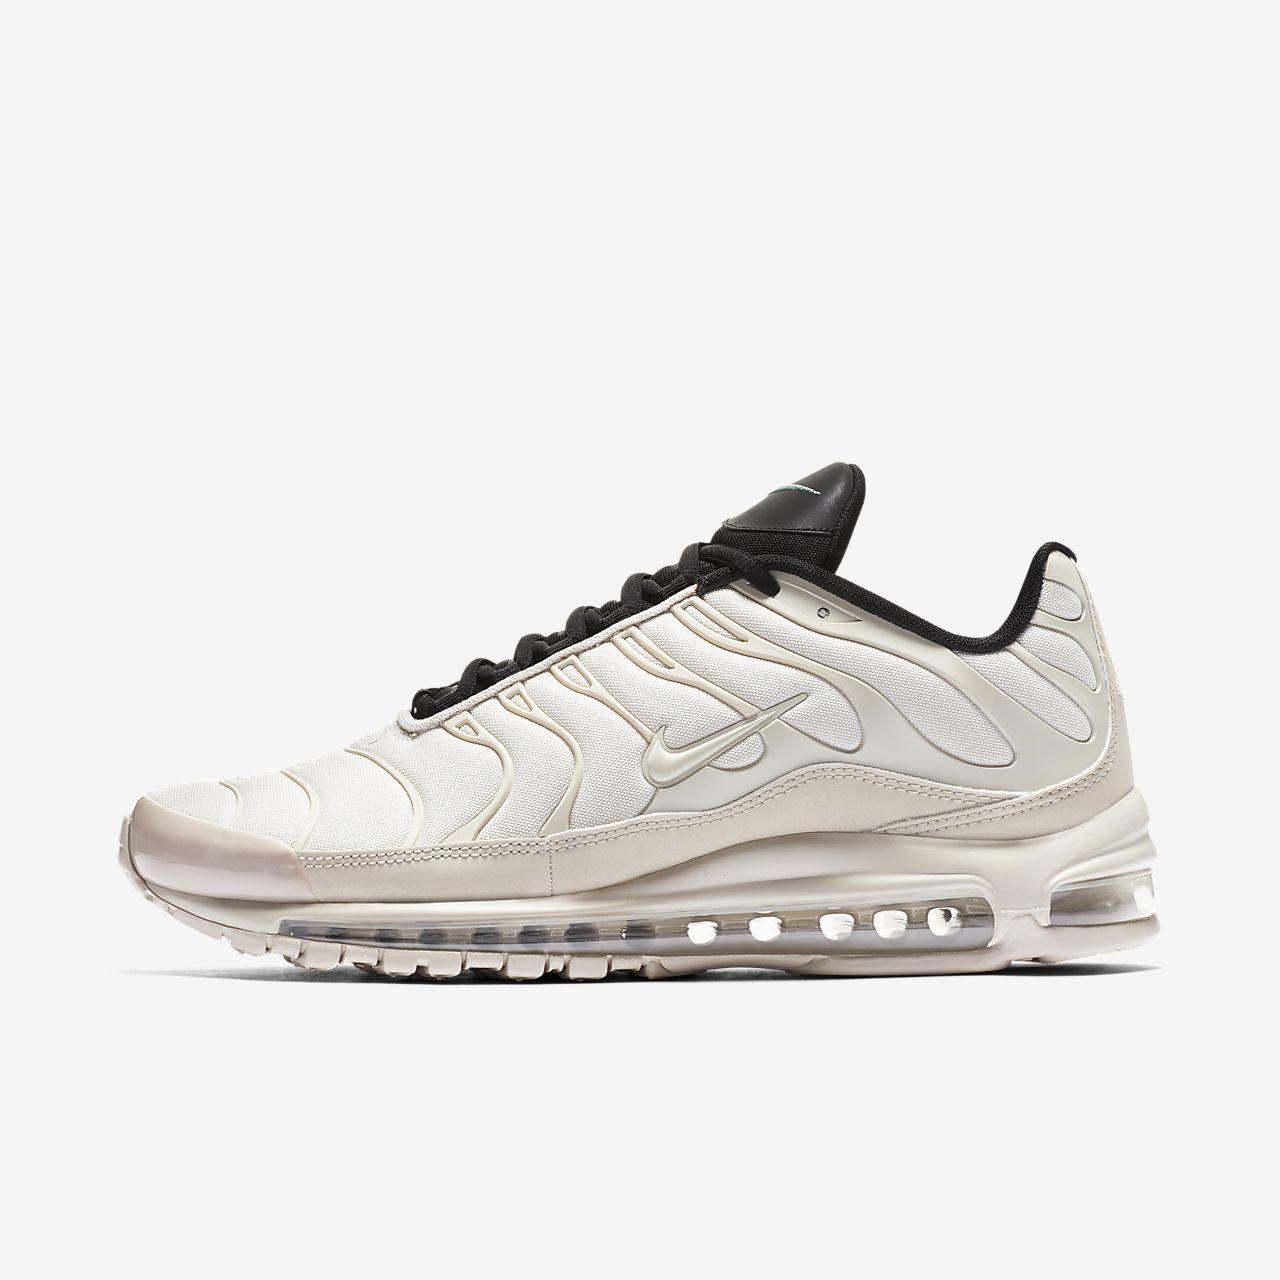 low priced 5b0f3 039d9 ... Buty męskie Nike Air Max 97 Plus